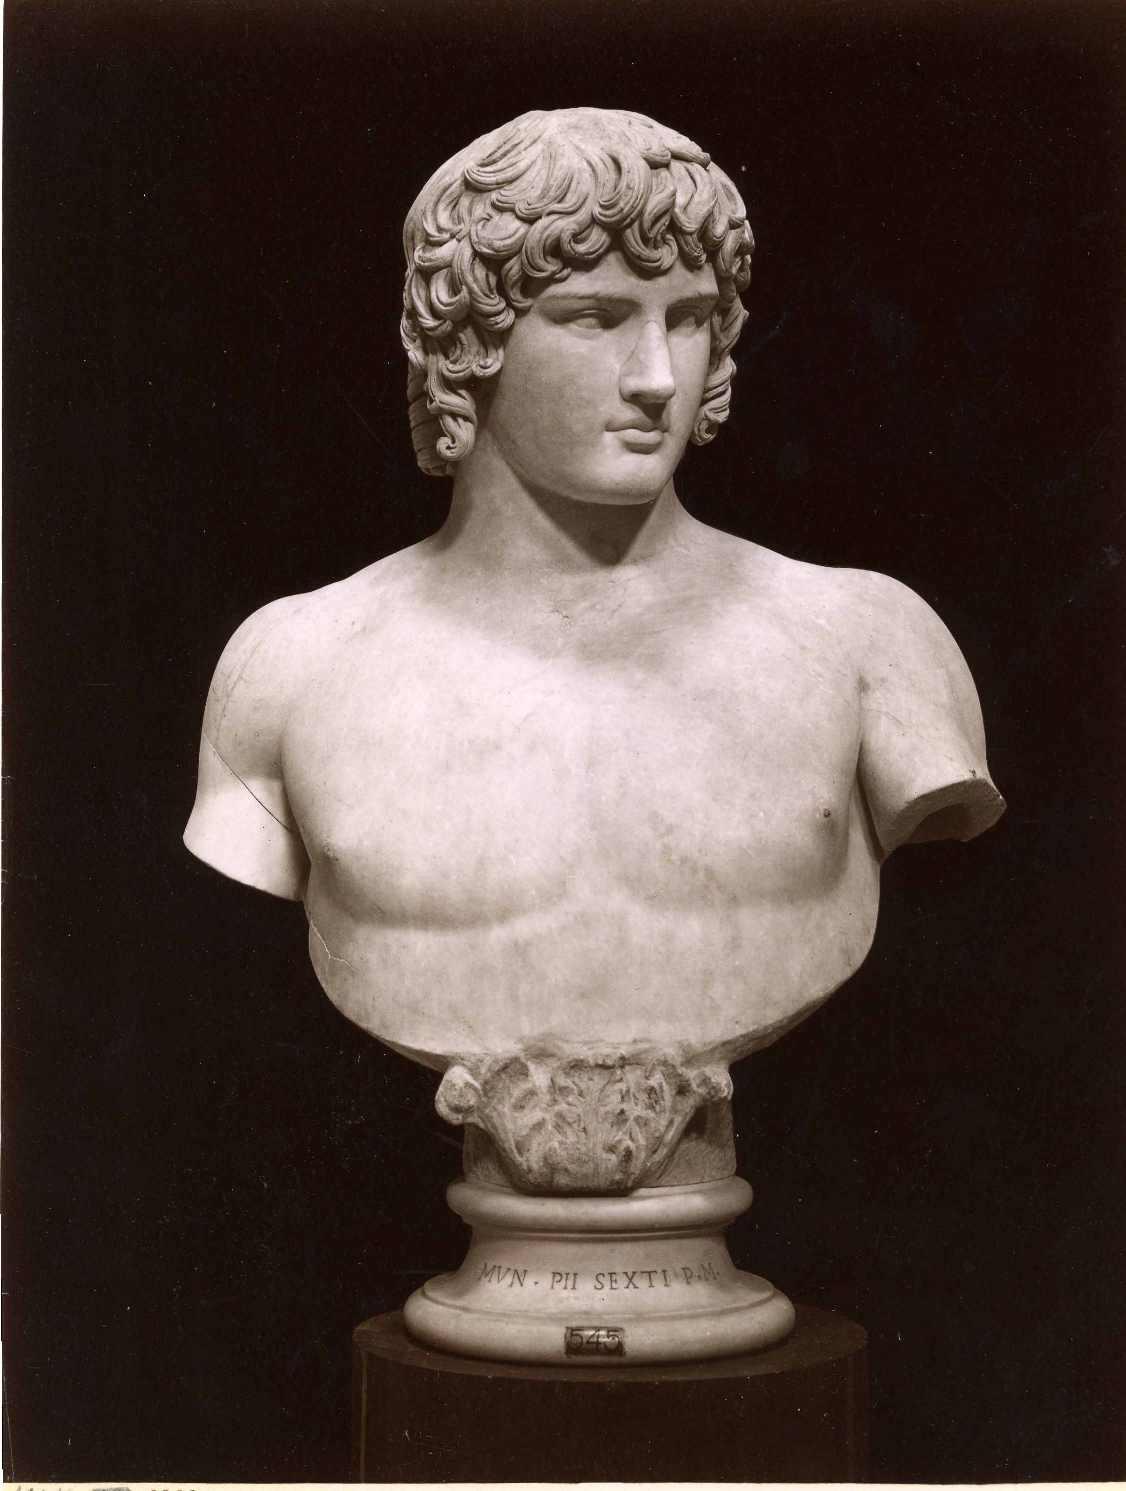 anderson_james_1813-1877_antinoo_ai_musei_vaticani_ca-_1860